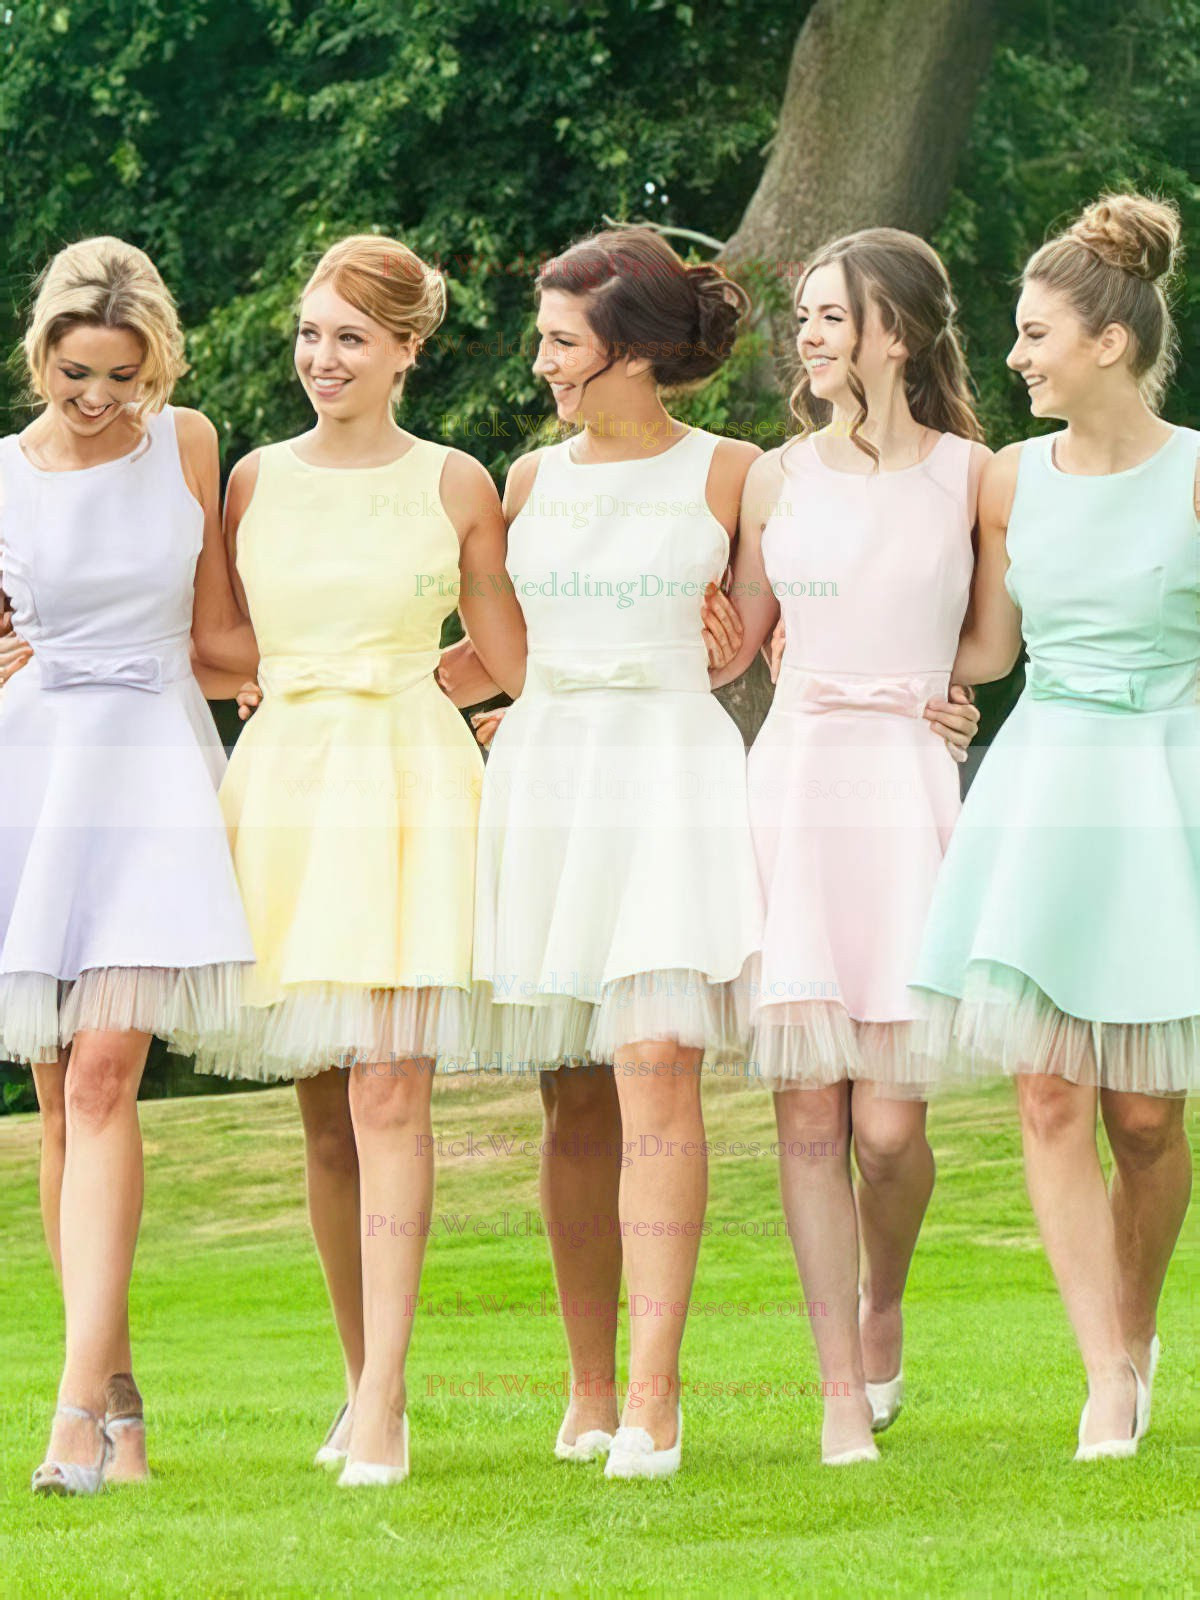 http://www.pickweddingdresses.com/open-back-a-line-short-mini-satin-tulle-with-bow-cute-bridesmaid-dresses-pwd01012816-p1890.html?utm_source=post&utm_medium=PWD007&utm_campaign=blog